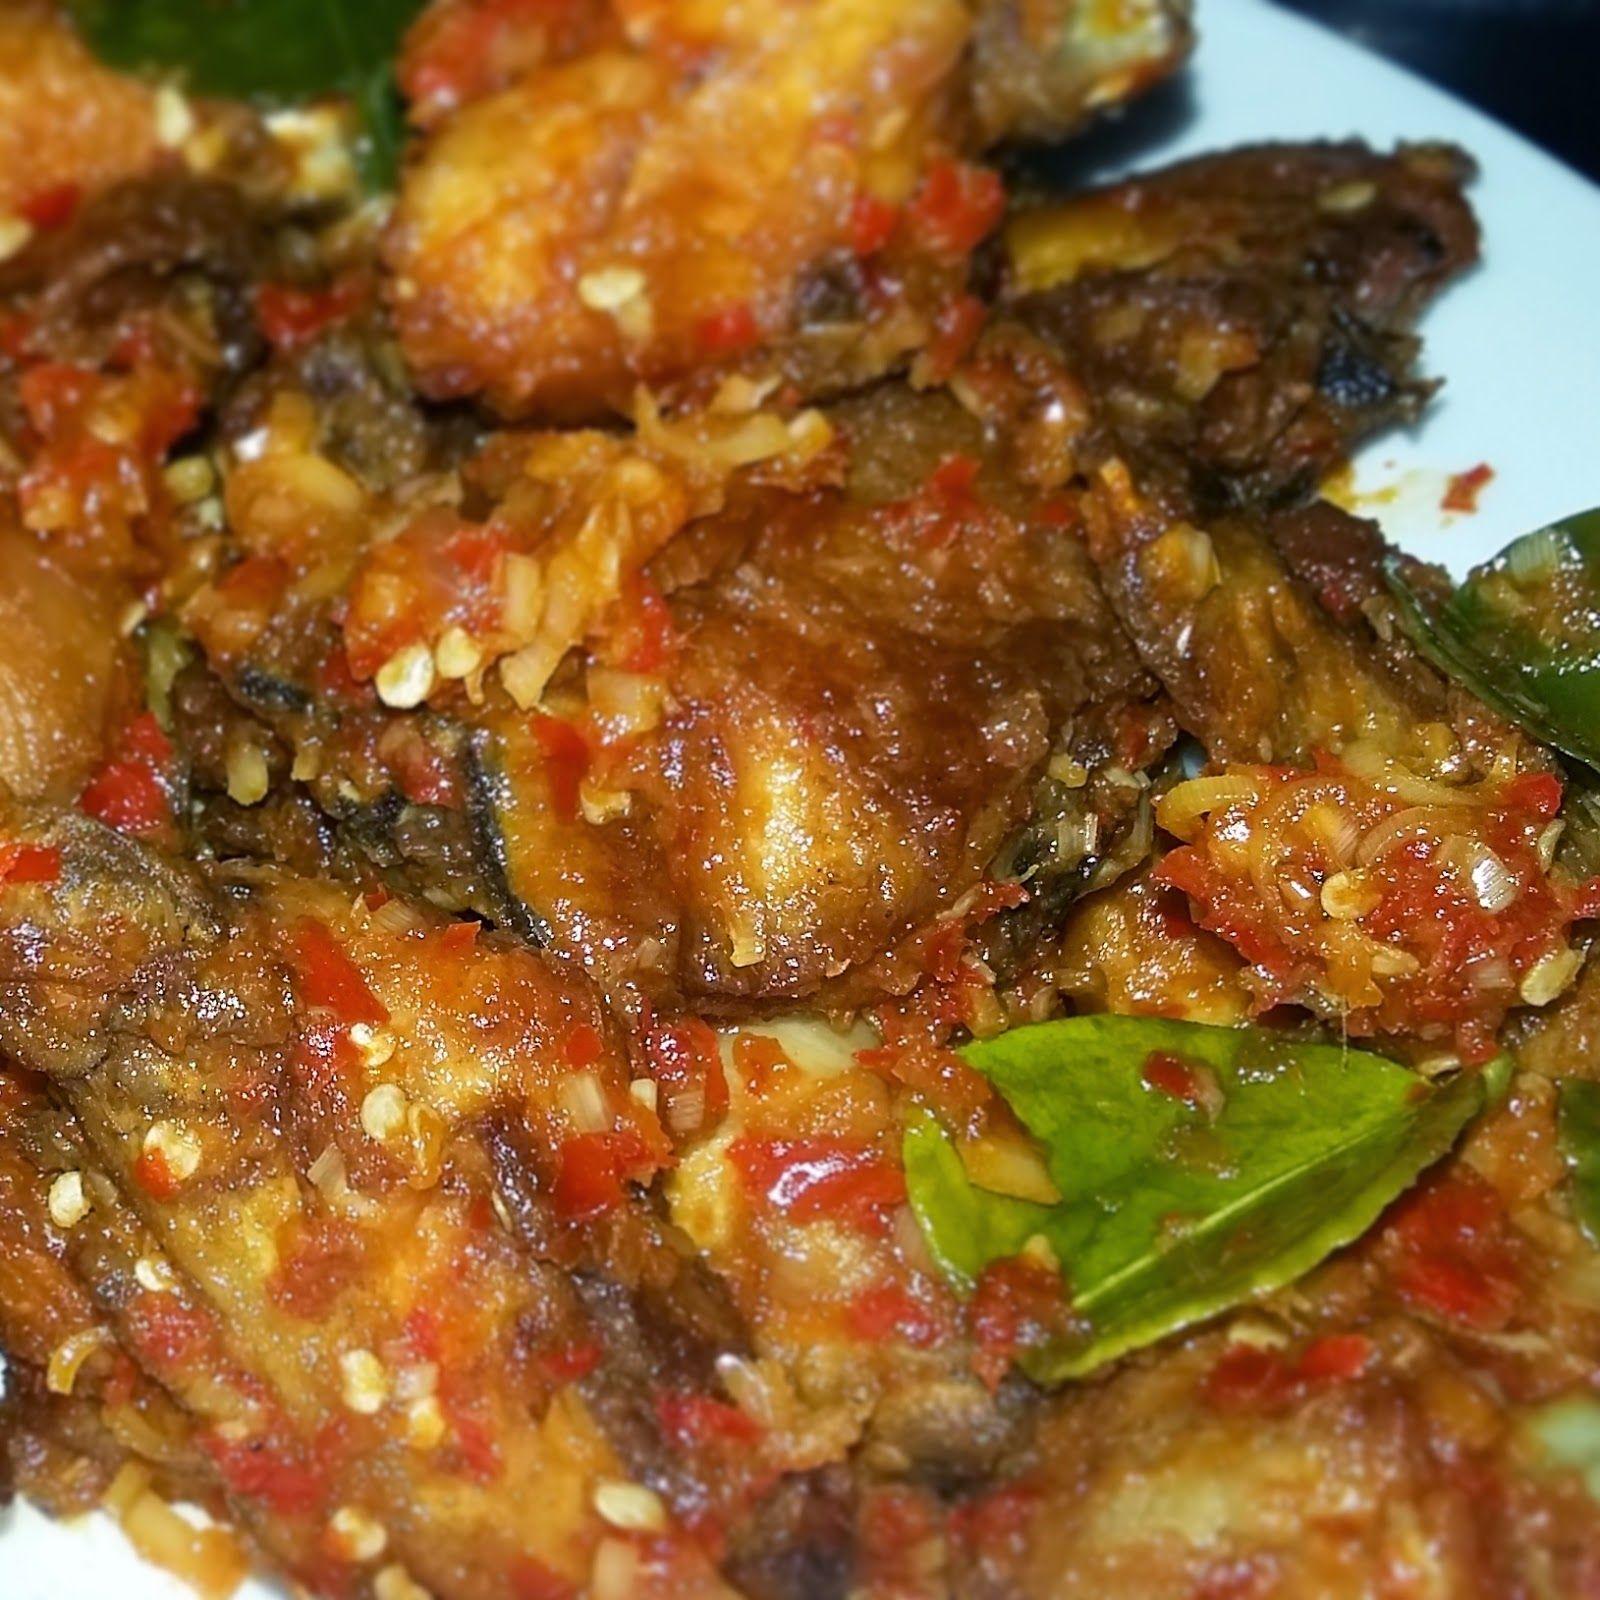 Resep Ayam Rica-Rica ~ Banyak sekali kreasi masakan ayam, di negeri ...